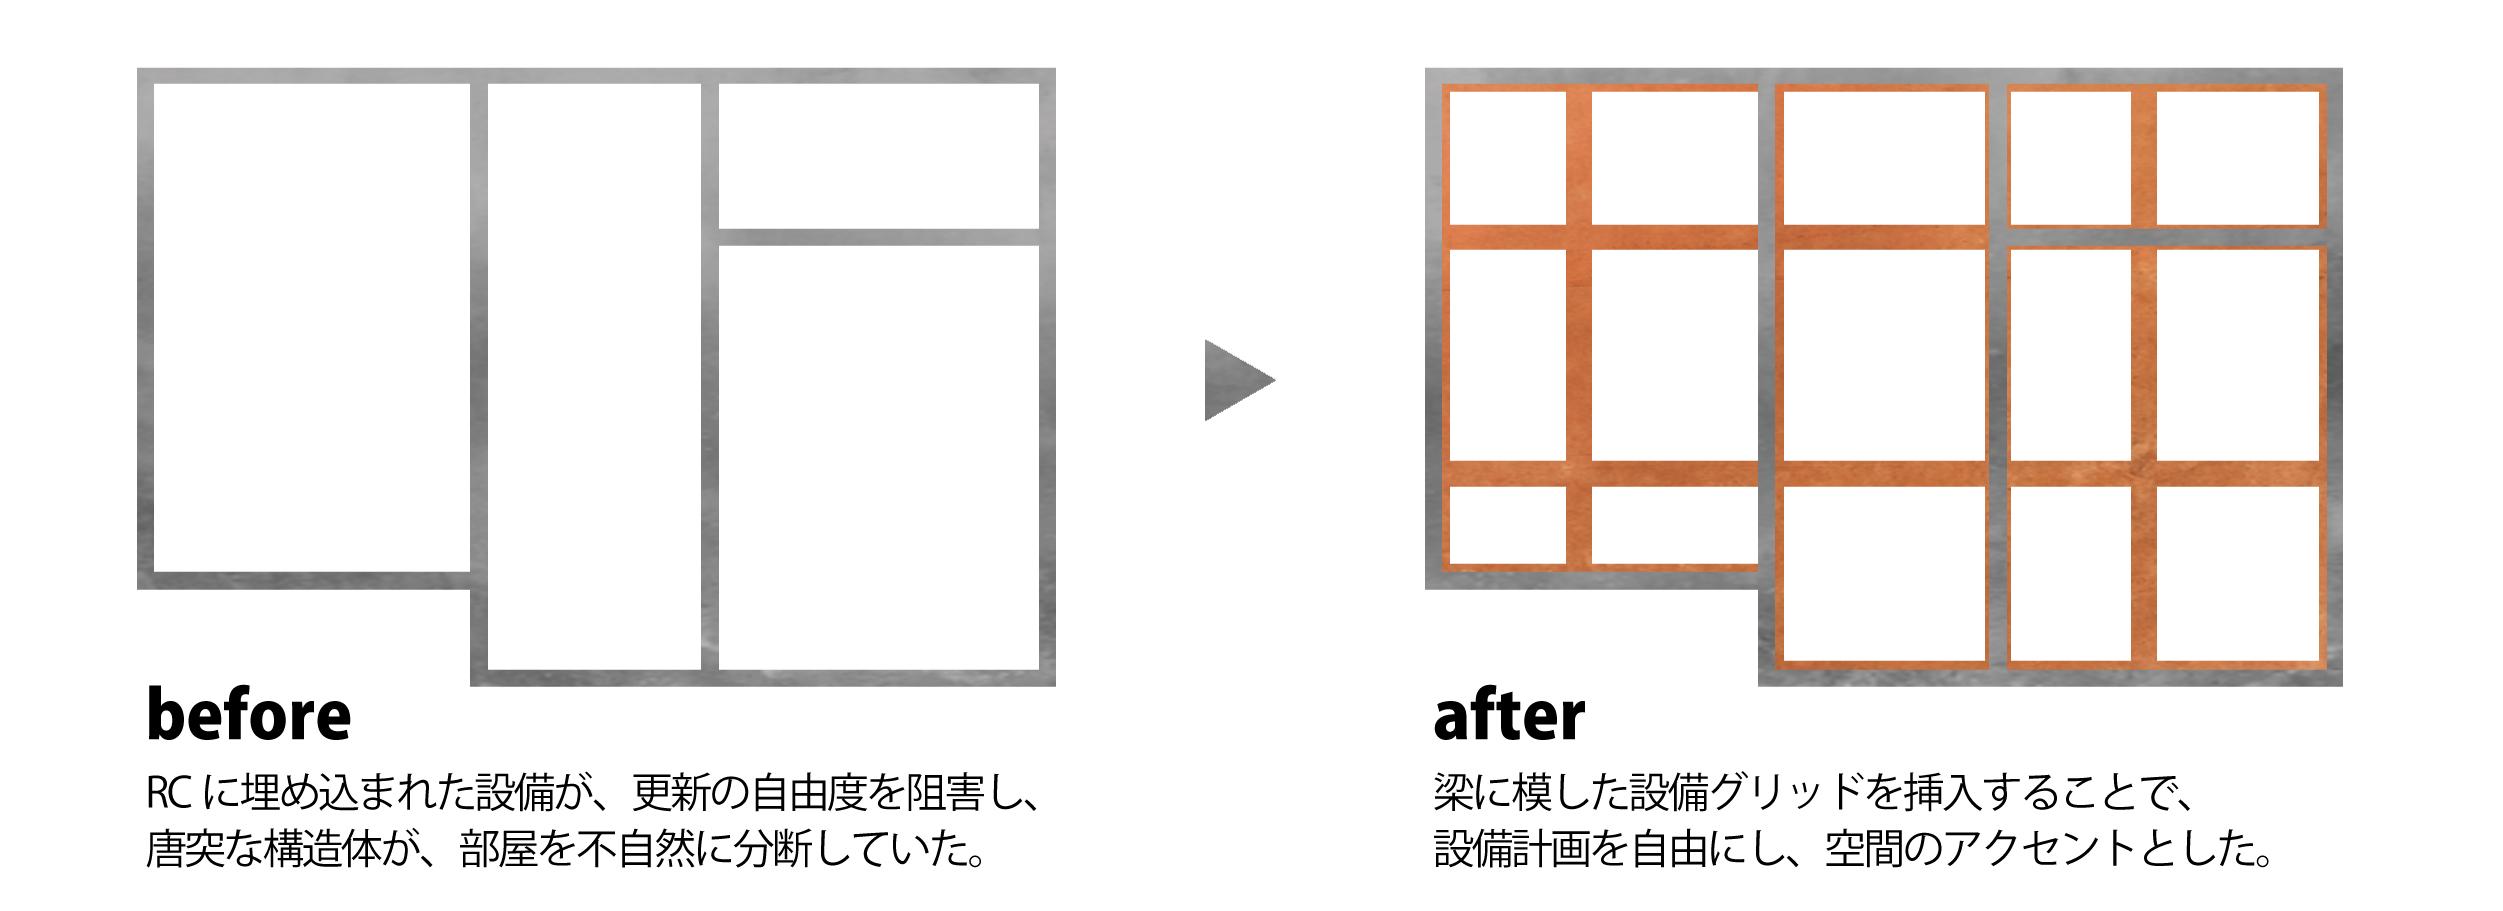 RoD-house_diagram